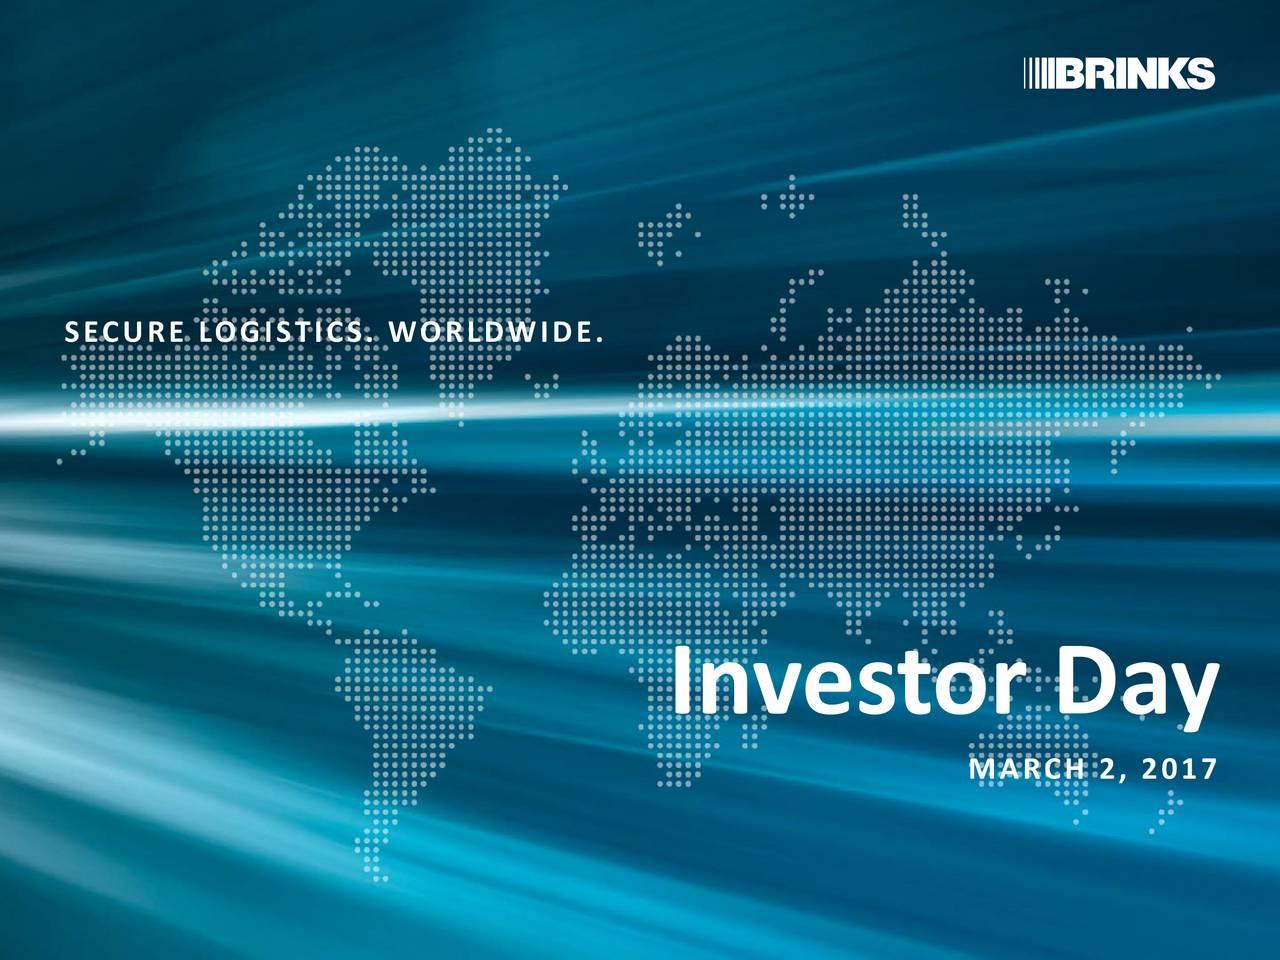 Investor Day MARCH 2, 2017